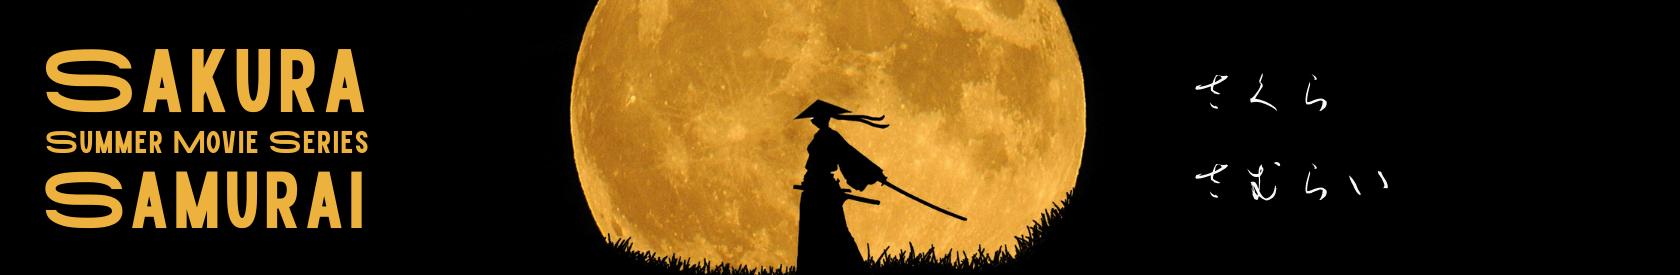 "Sakura Samurai – Summer Movie Series Presents an Outdoor Screening of ""A Tale of Samurai Cooking: A True Love Story"""